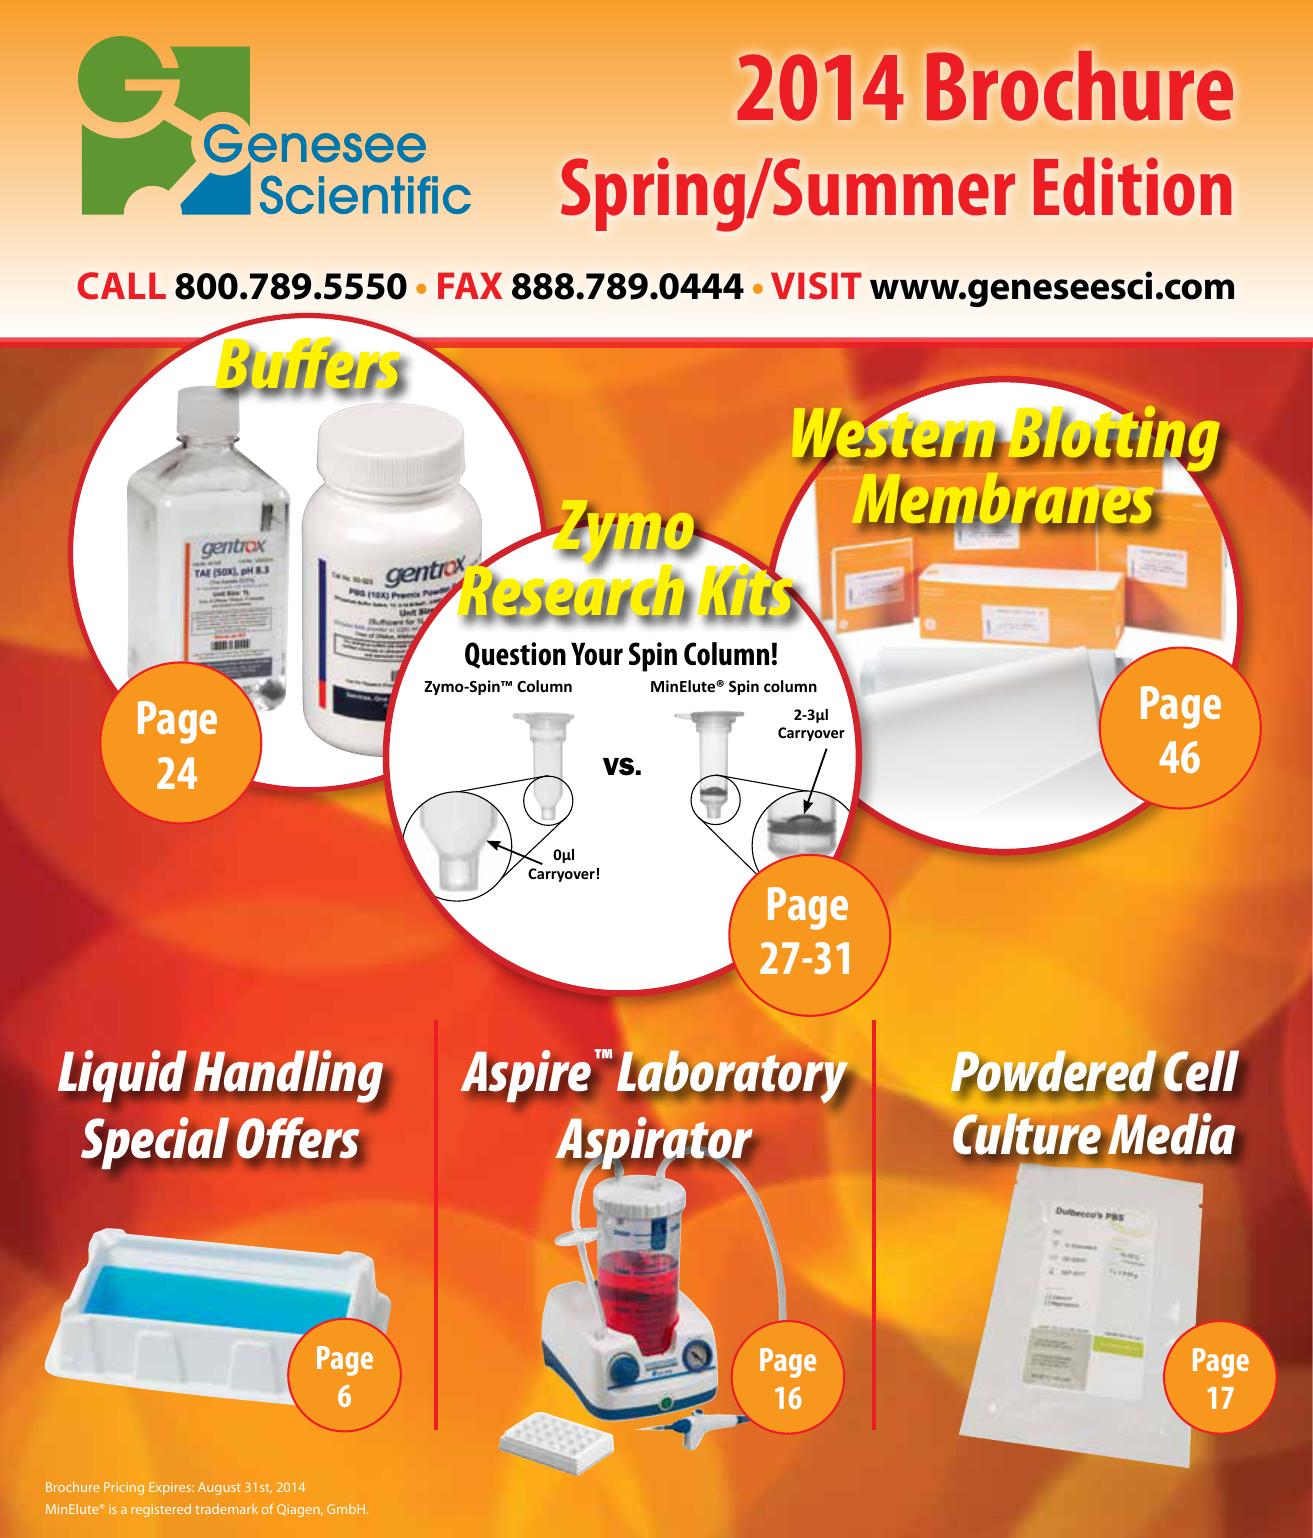 2014 Brochure Genesee Scientific | Manualzz